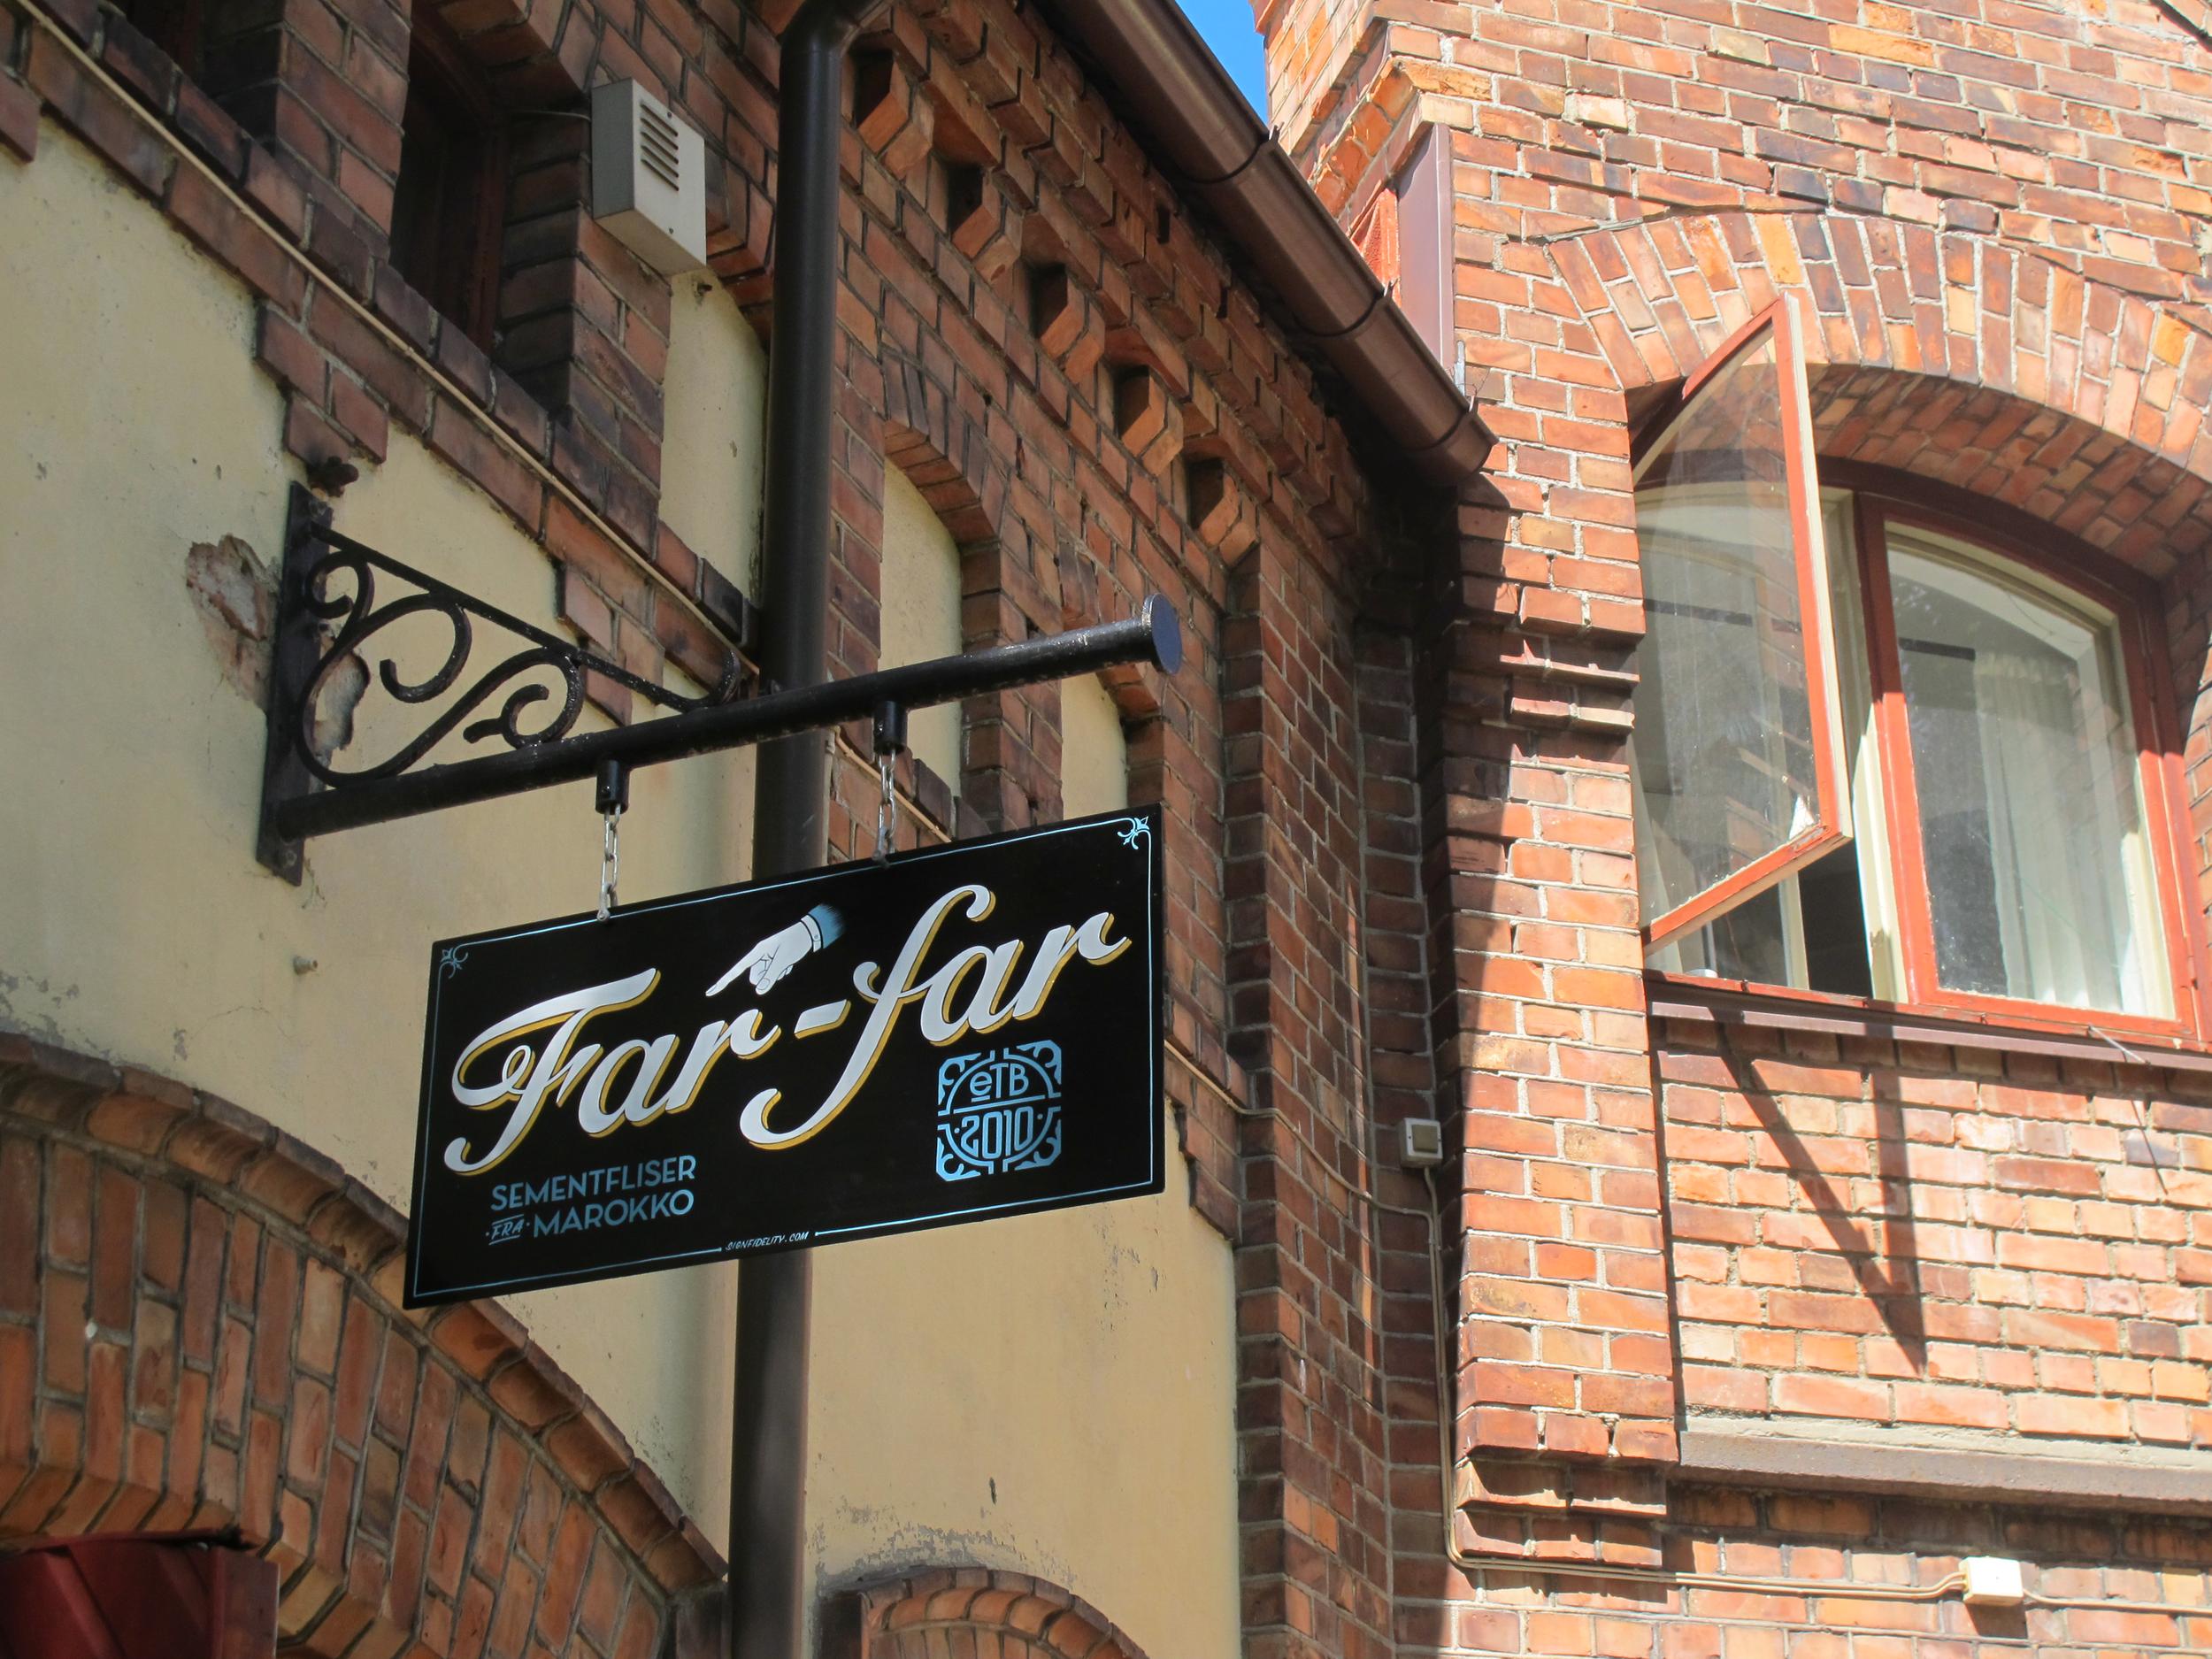 Far_far_final_top.png